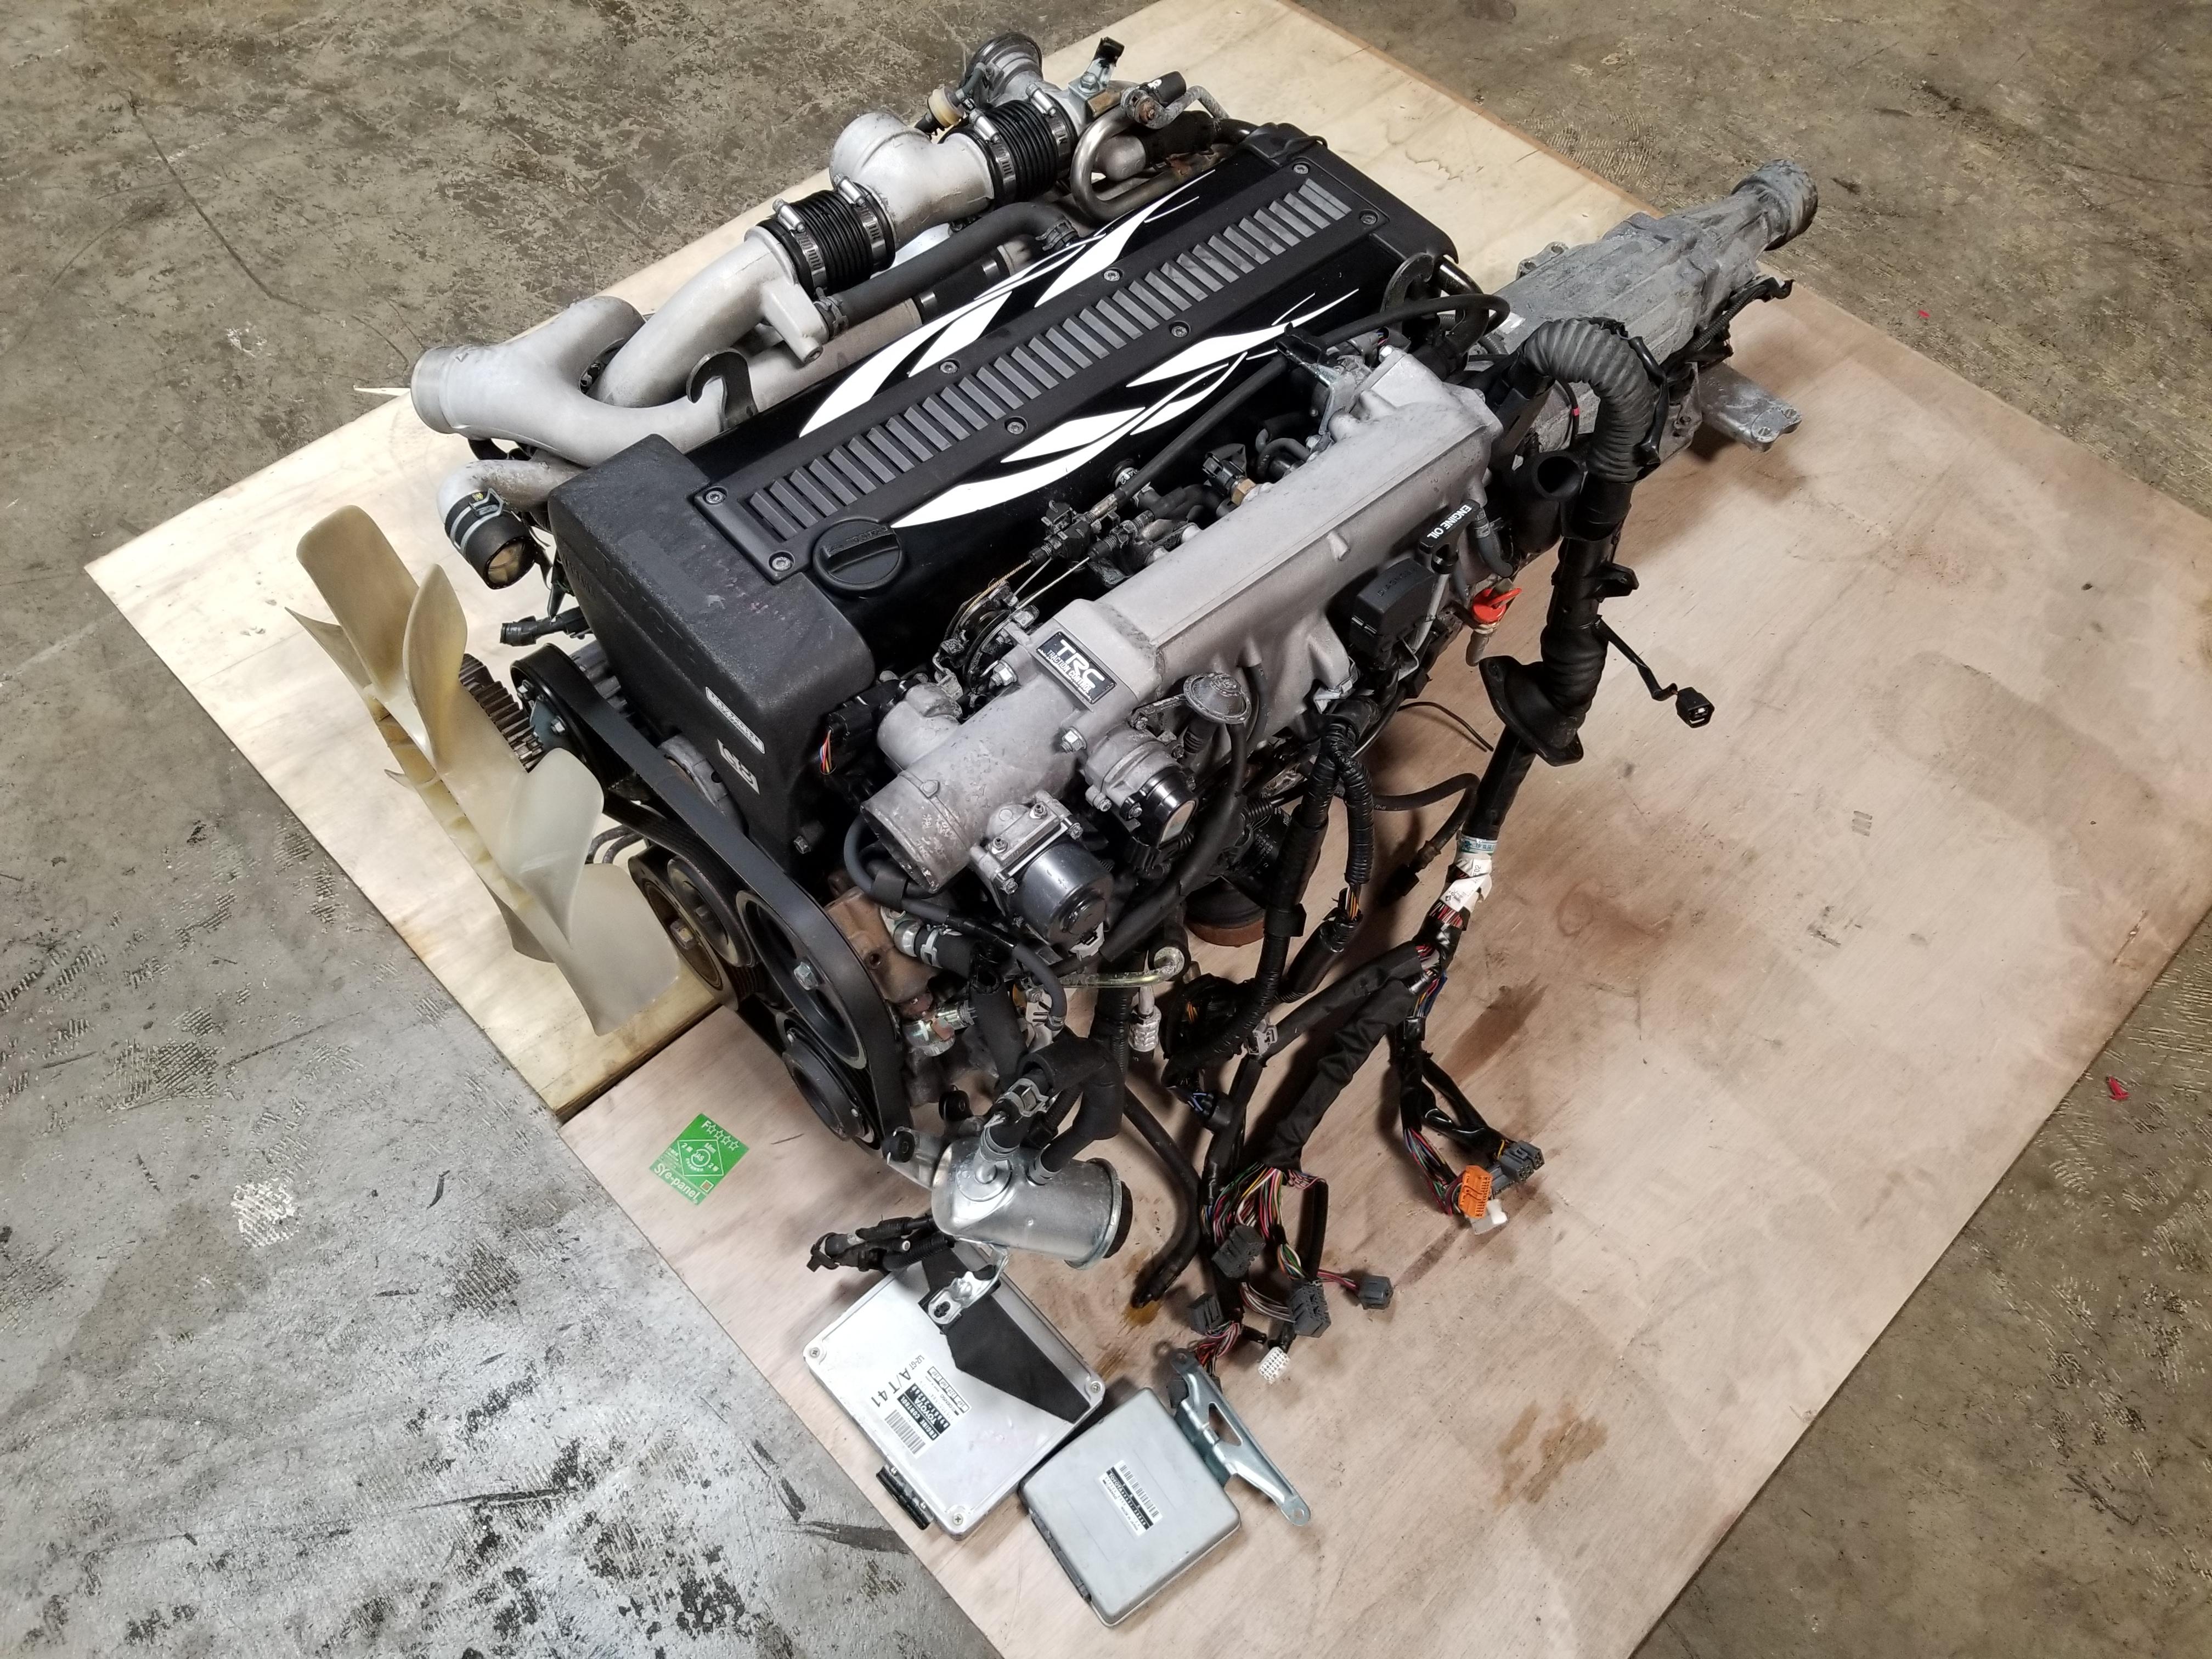 Nissan Chula Vista >> 1JZGTE Non-VVTi Twin Turbo Engine with Automatic